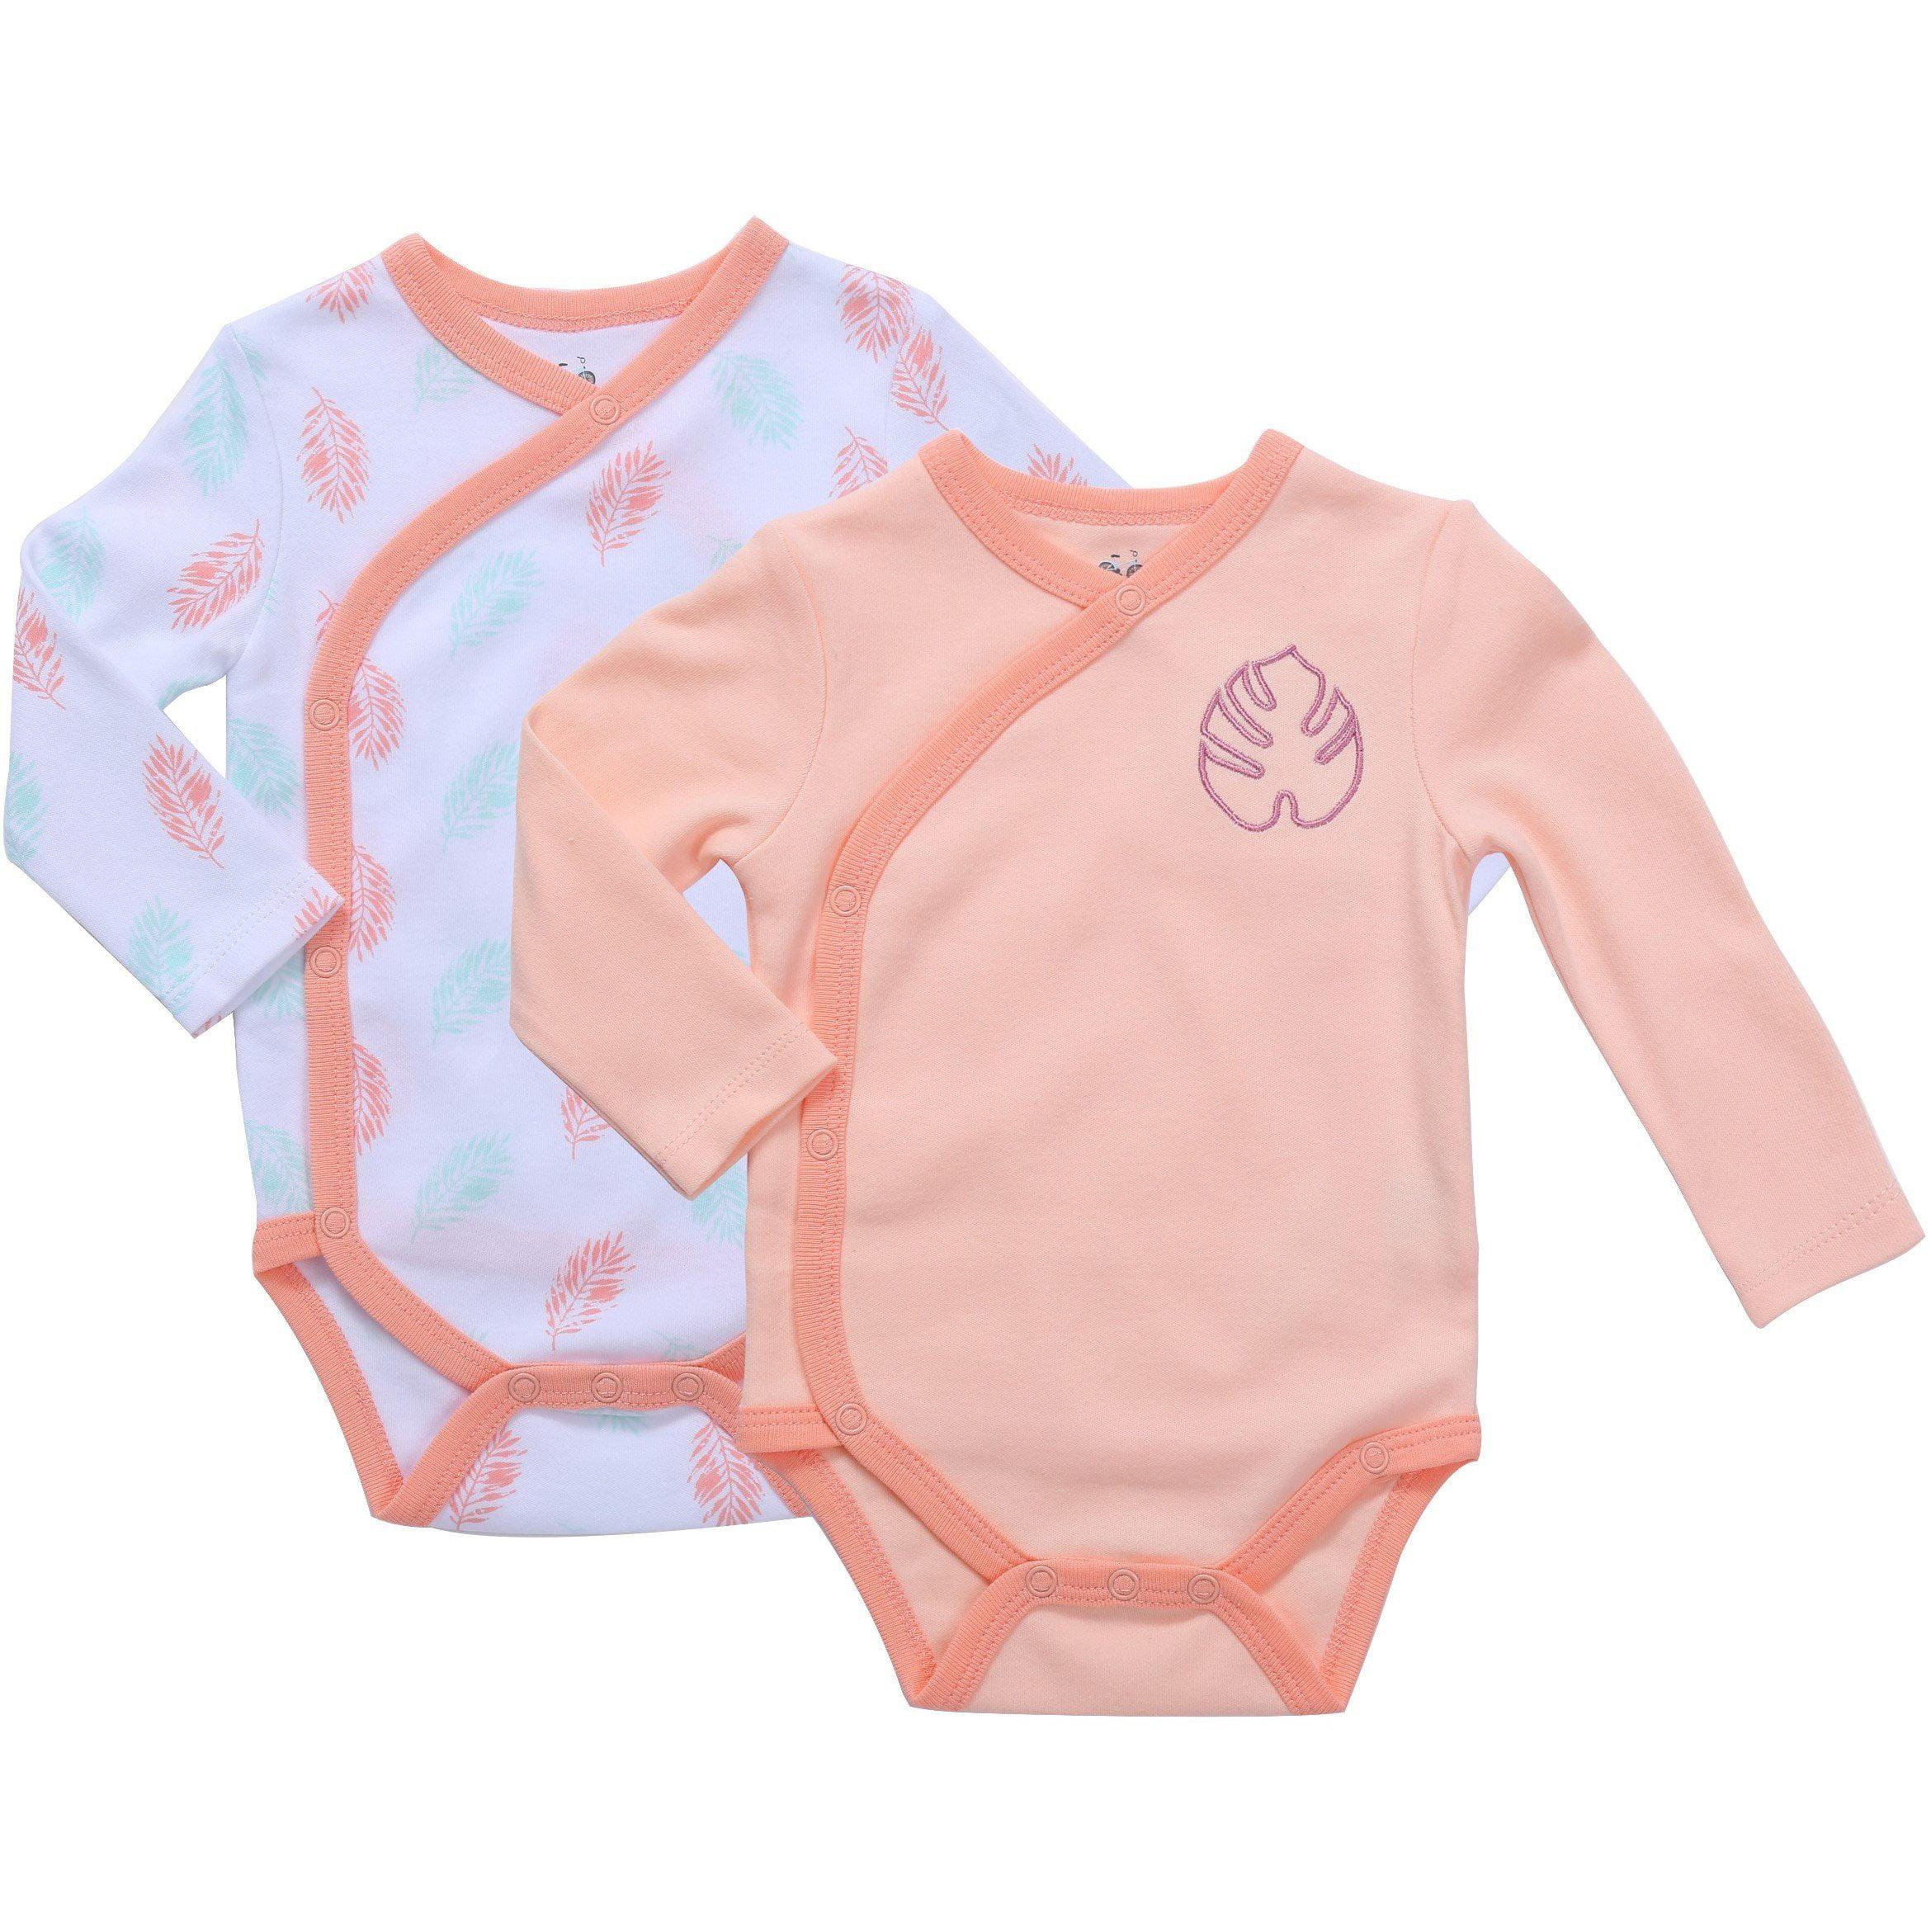 Asher and Olivia Baby Girls 3-Piece Long-Sleeve Kimono Bodysuit Set